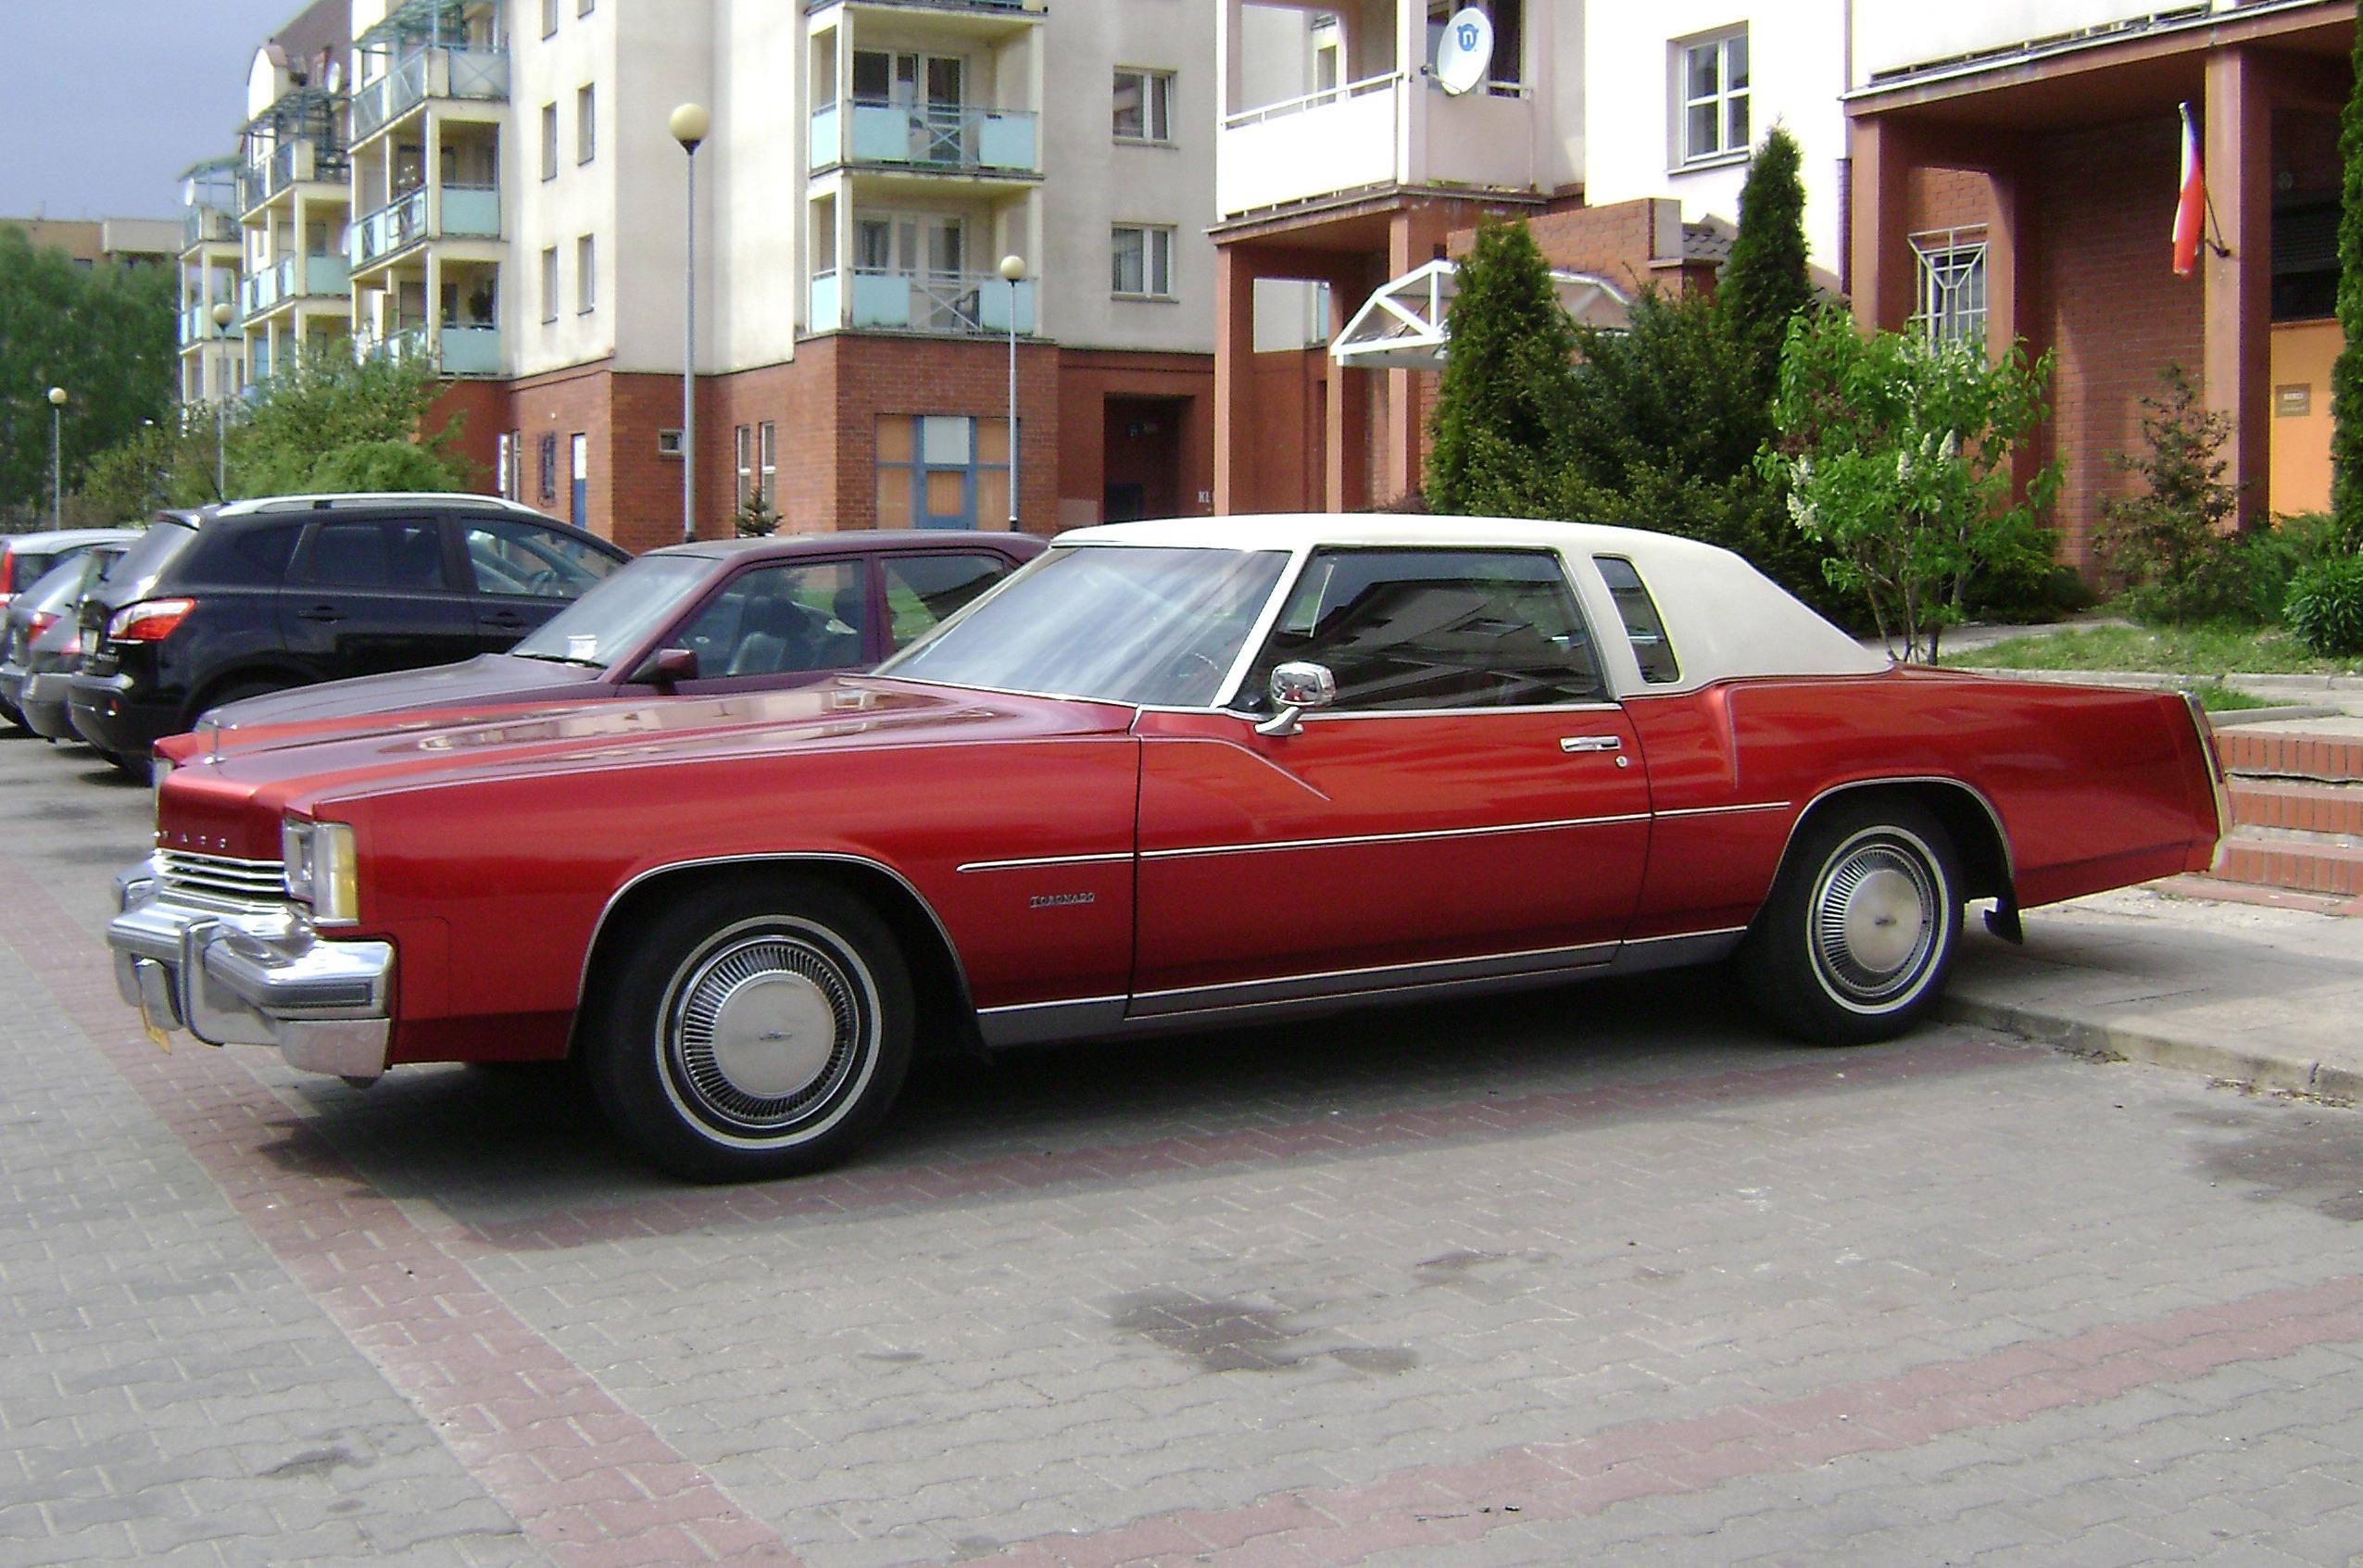 co cadillac convertible vehicles eldorado car classic lost found hd